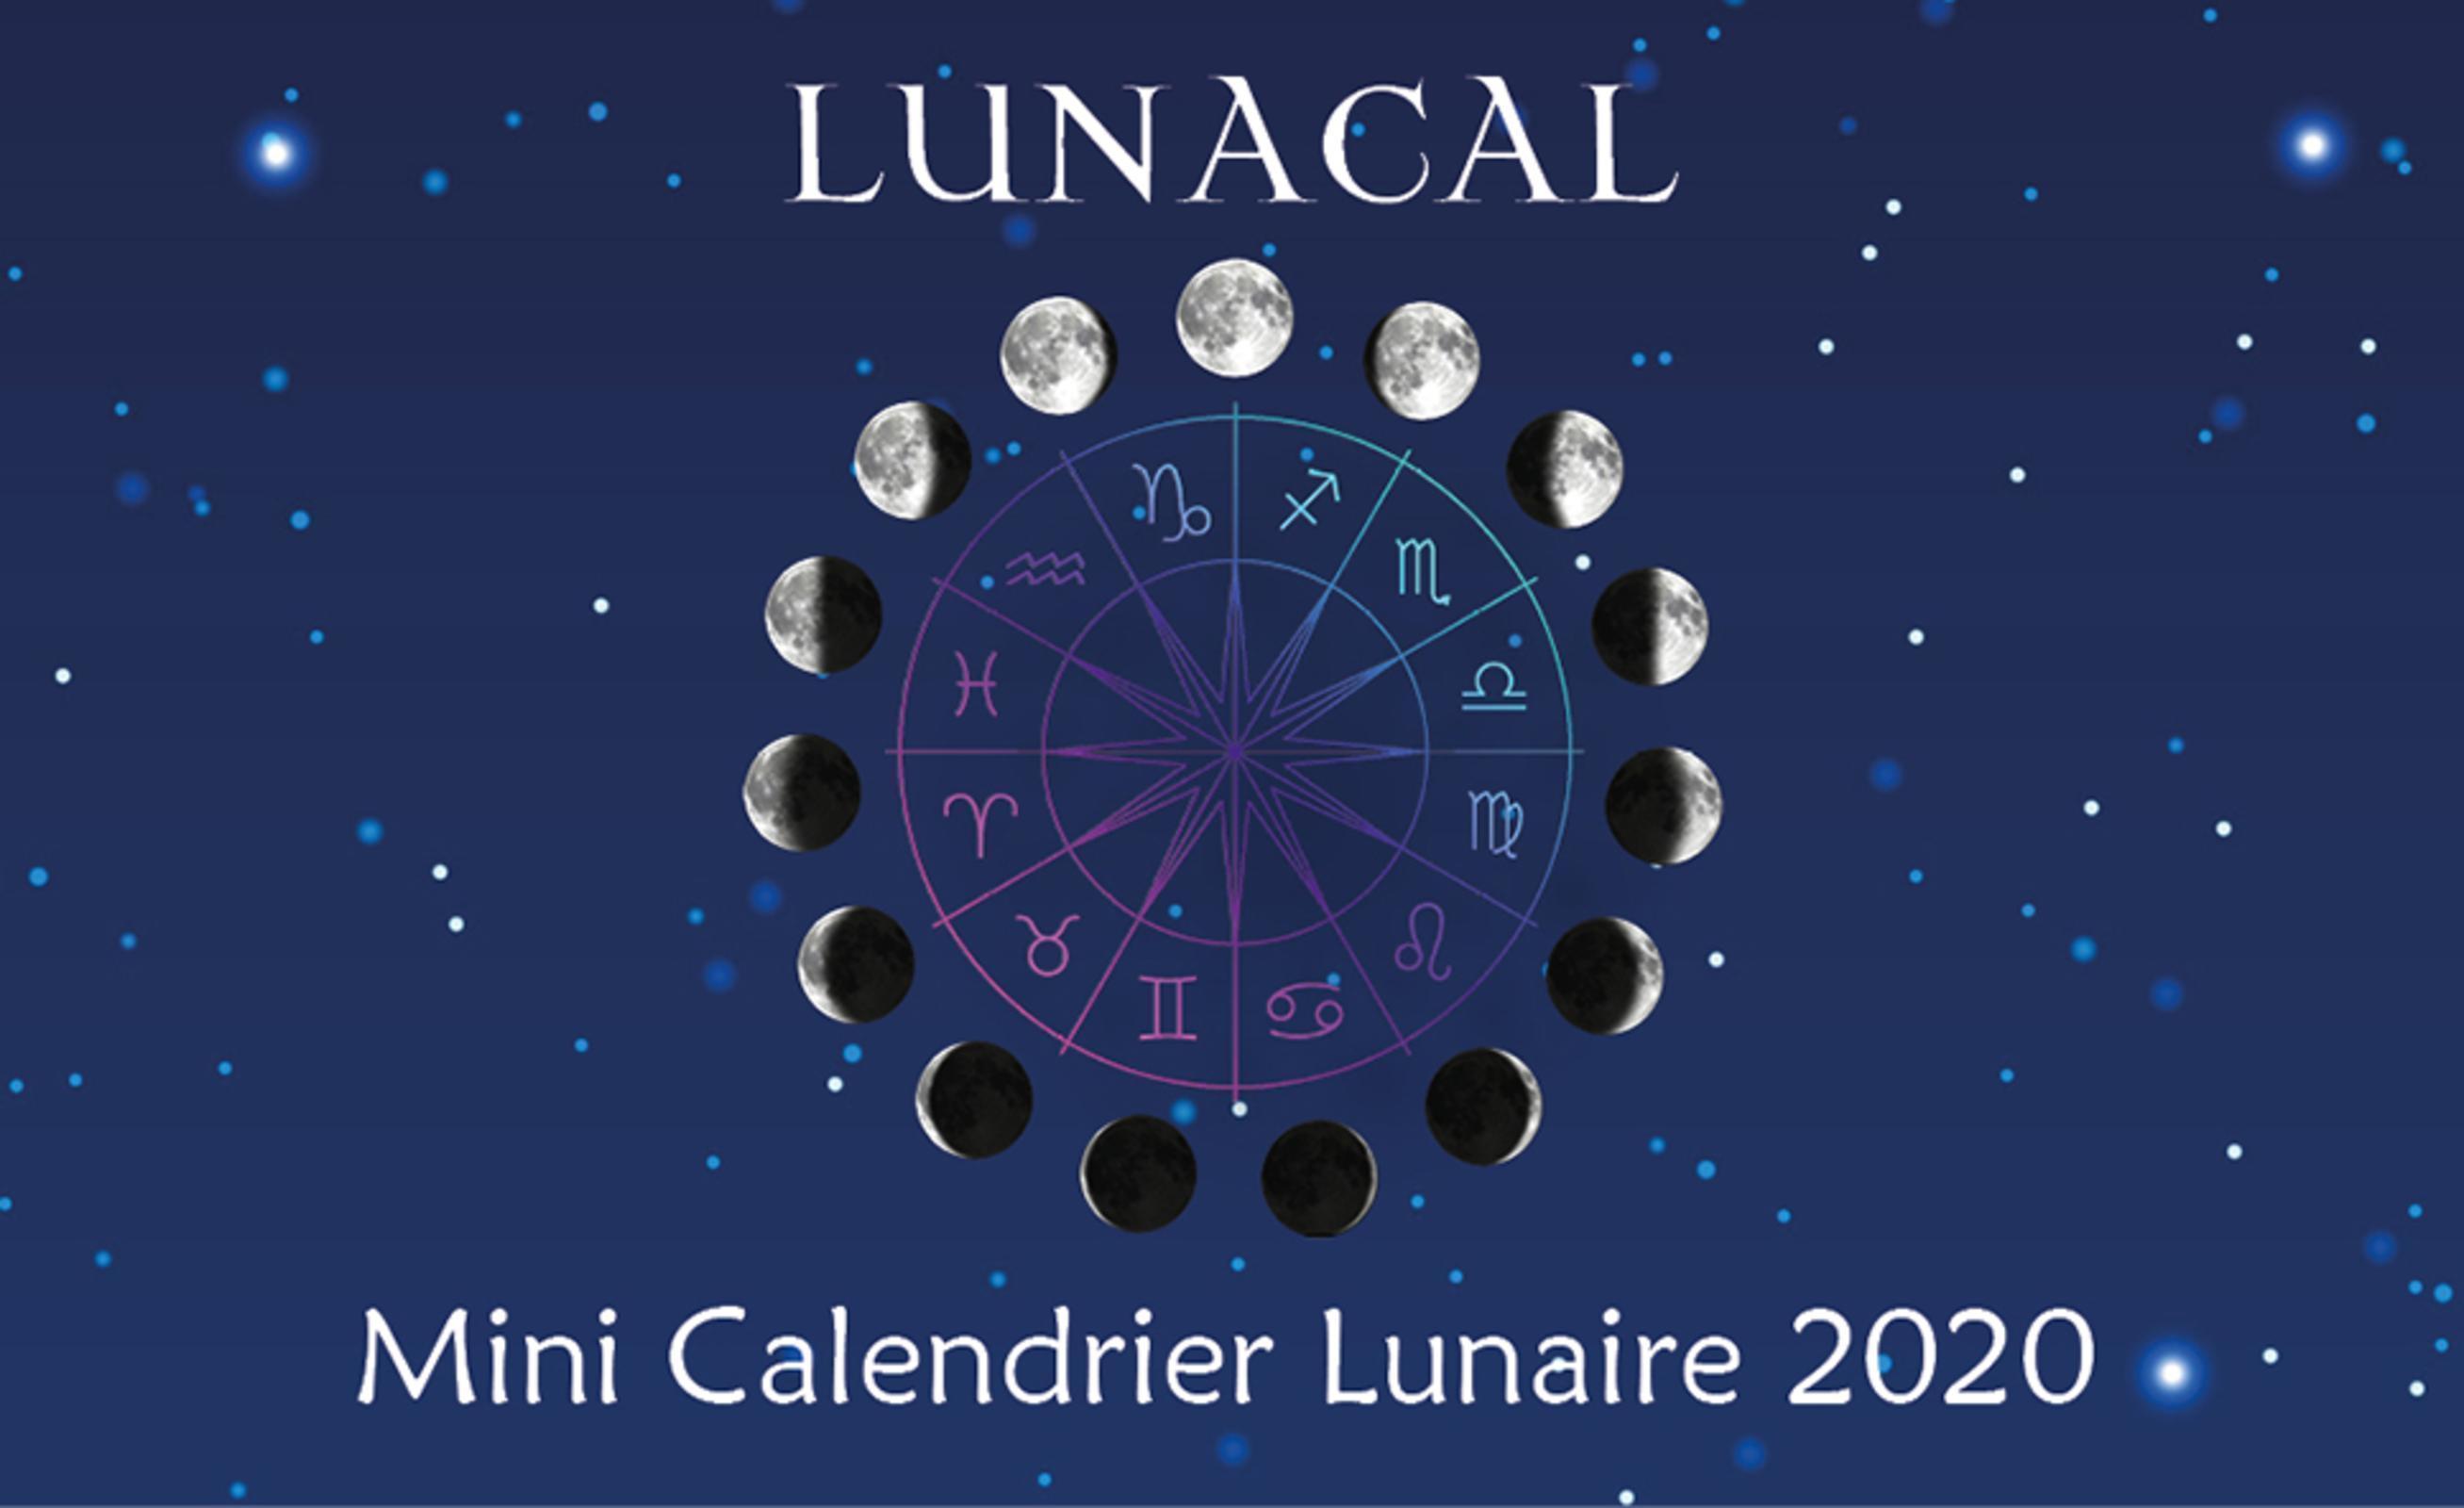 LUNACAL, MINI CALENDRIER LUNAIRE 2020